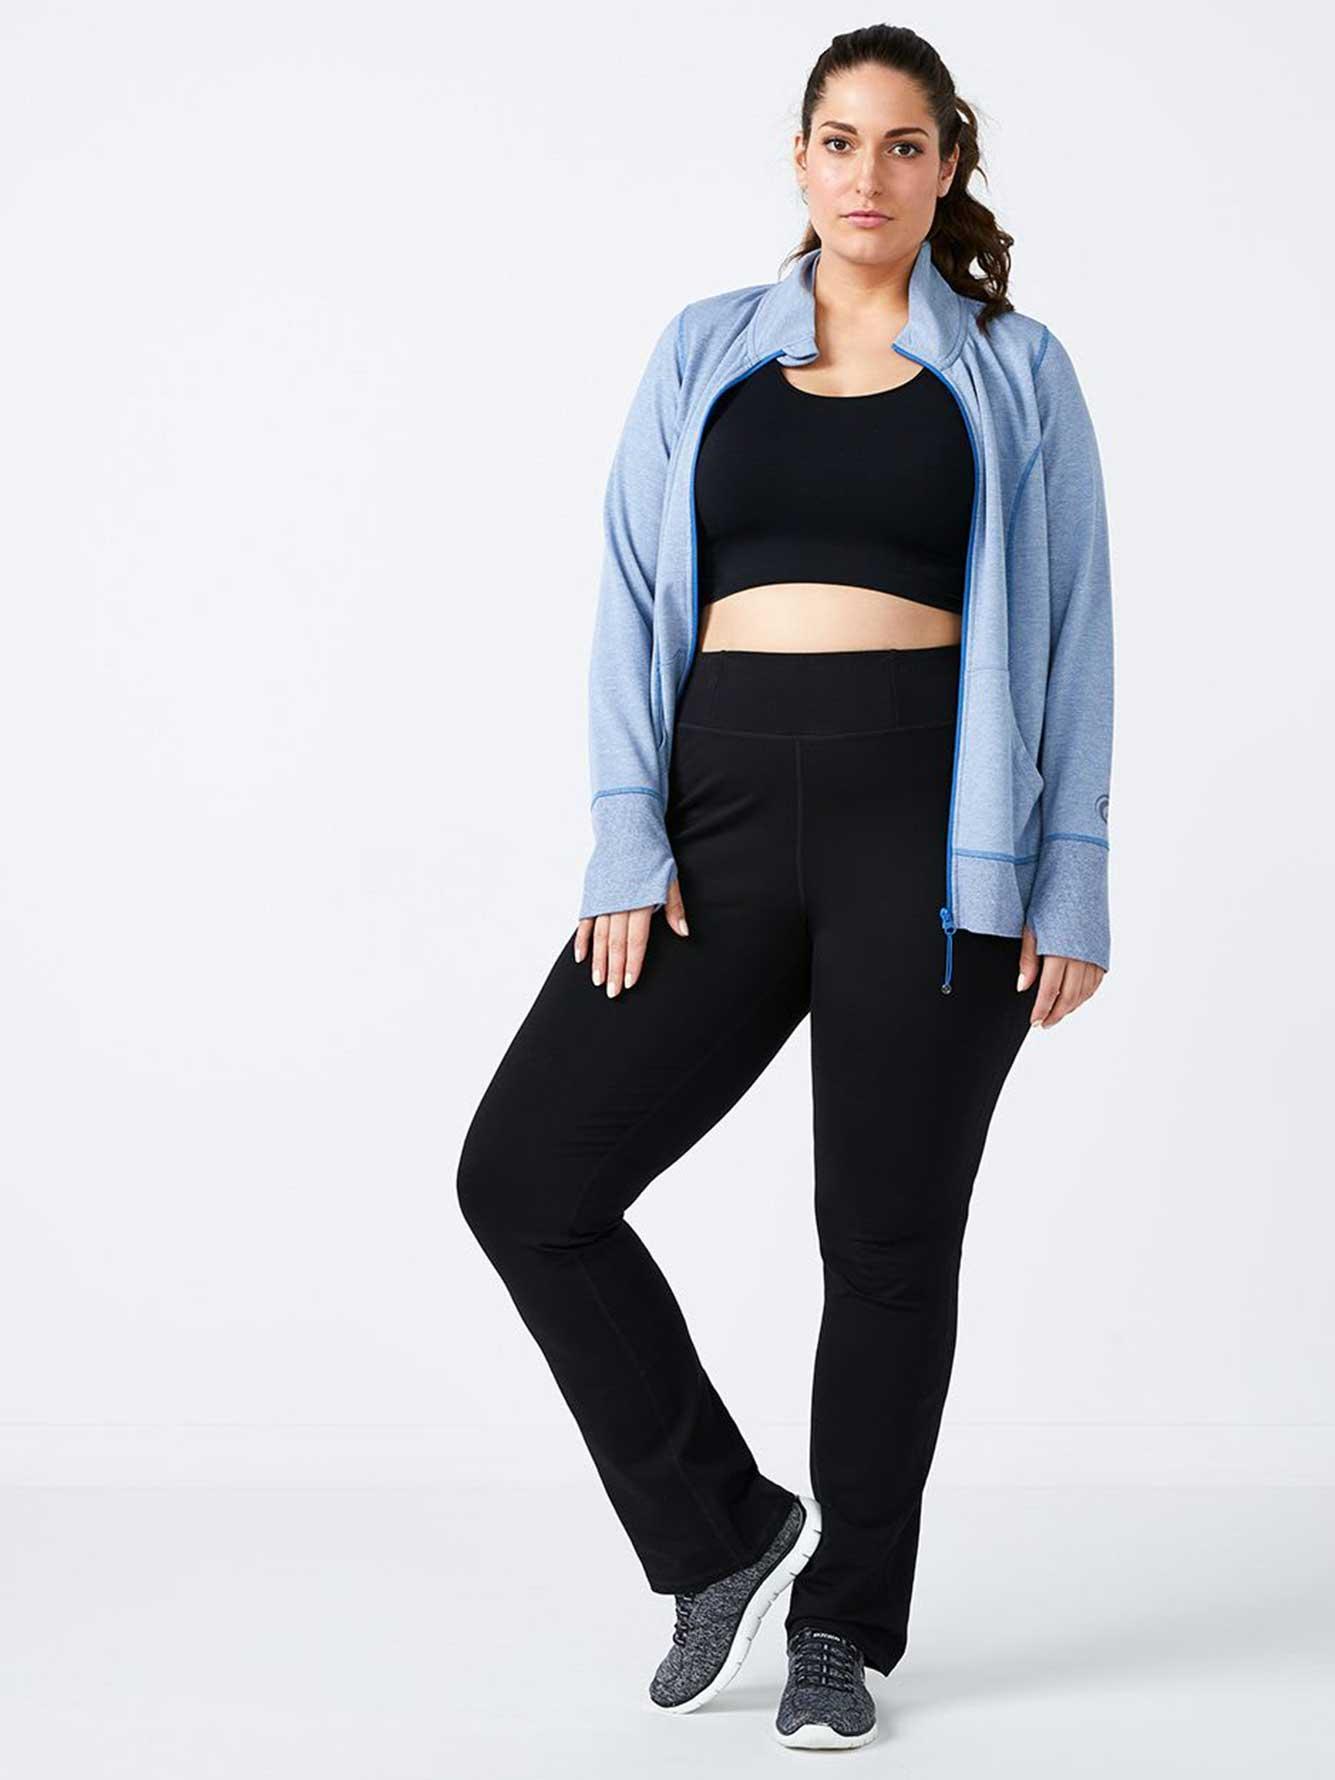 21130d258c0 Essentials - Plus-Size Basic Yoga Pant